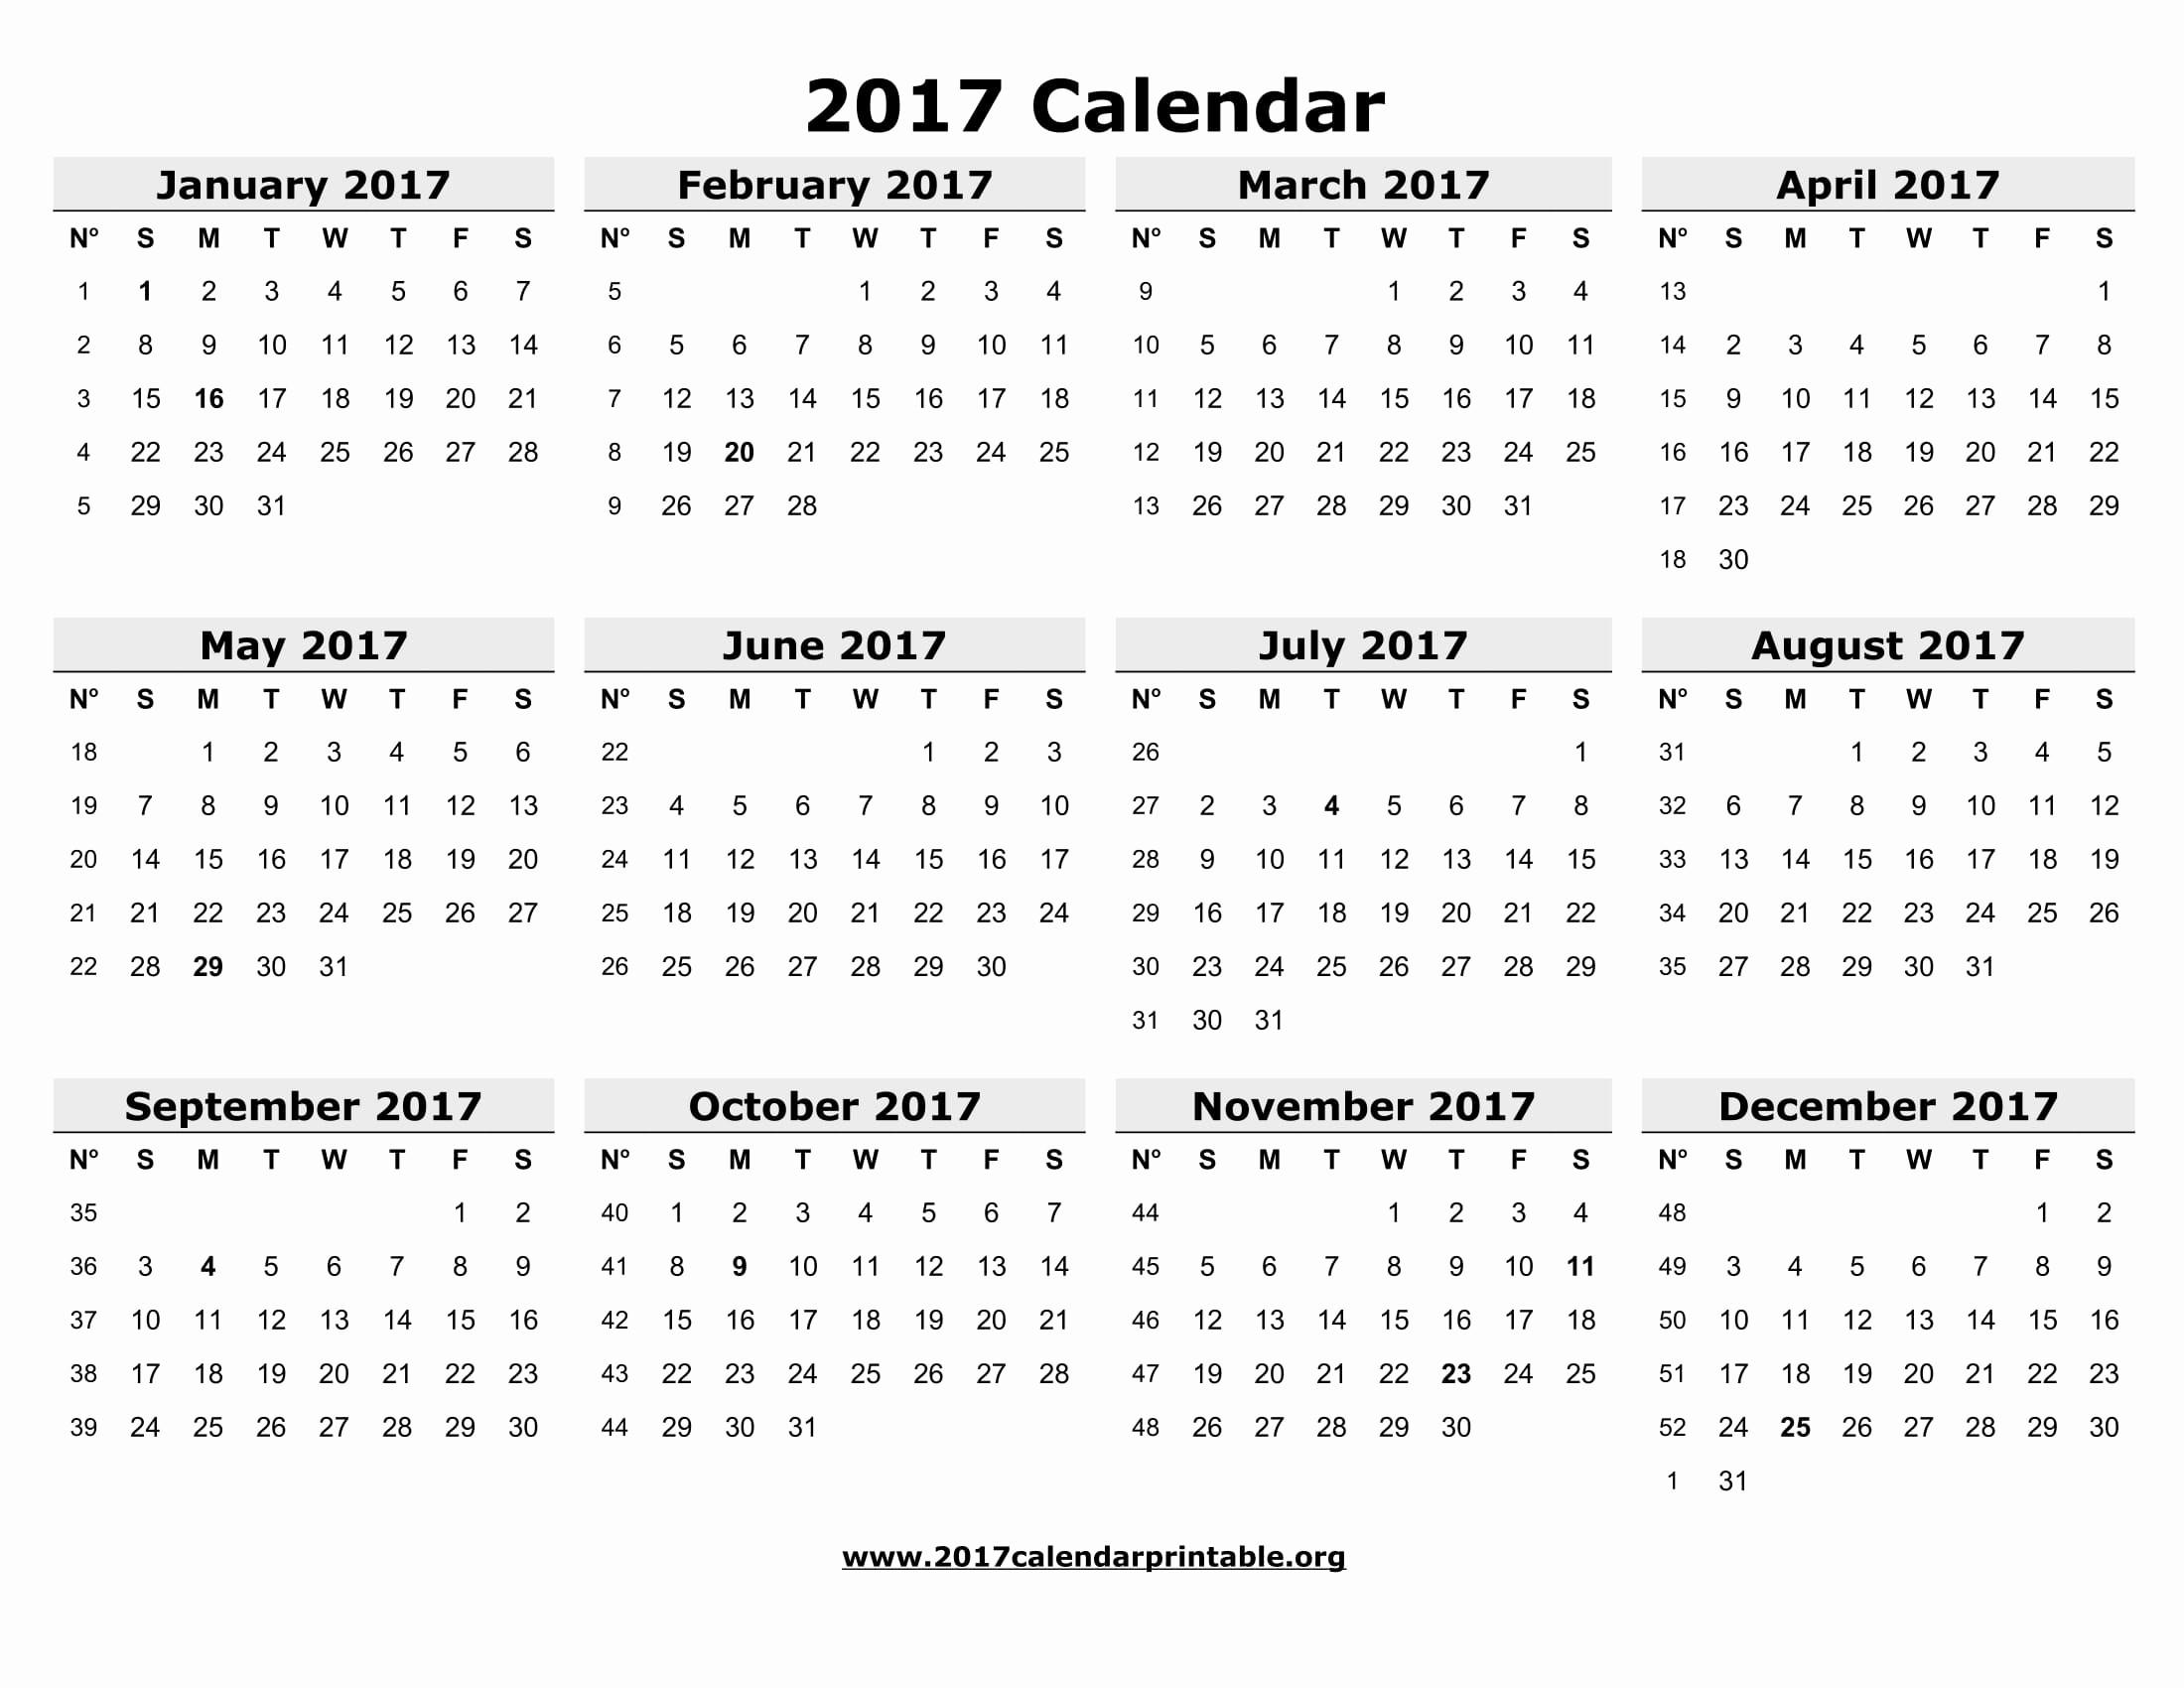 2017 12 Month Calendar Printable Best Of 12 Month Calendar 2017 Printable